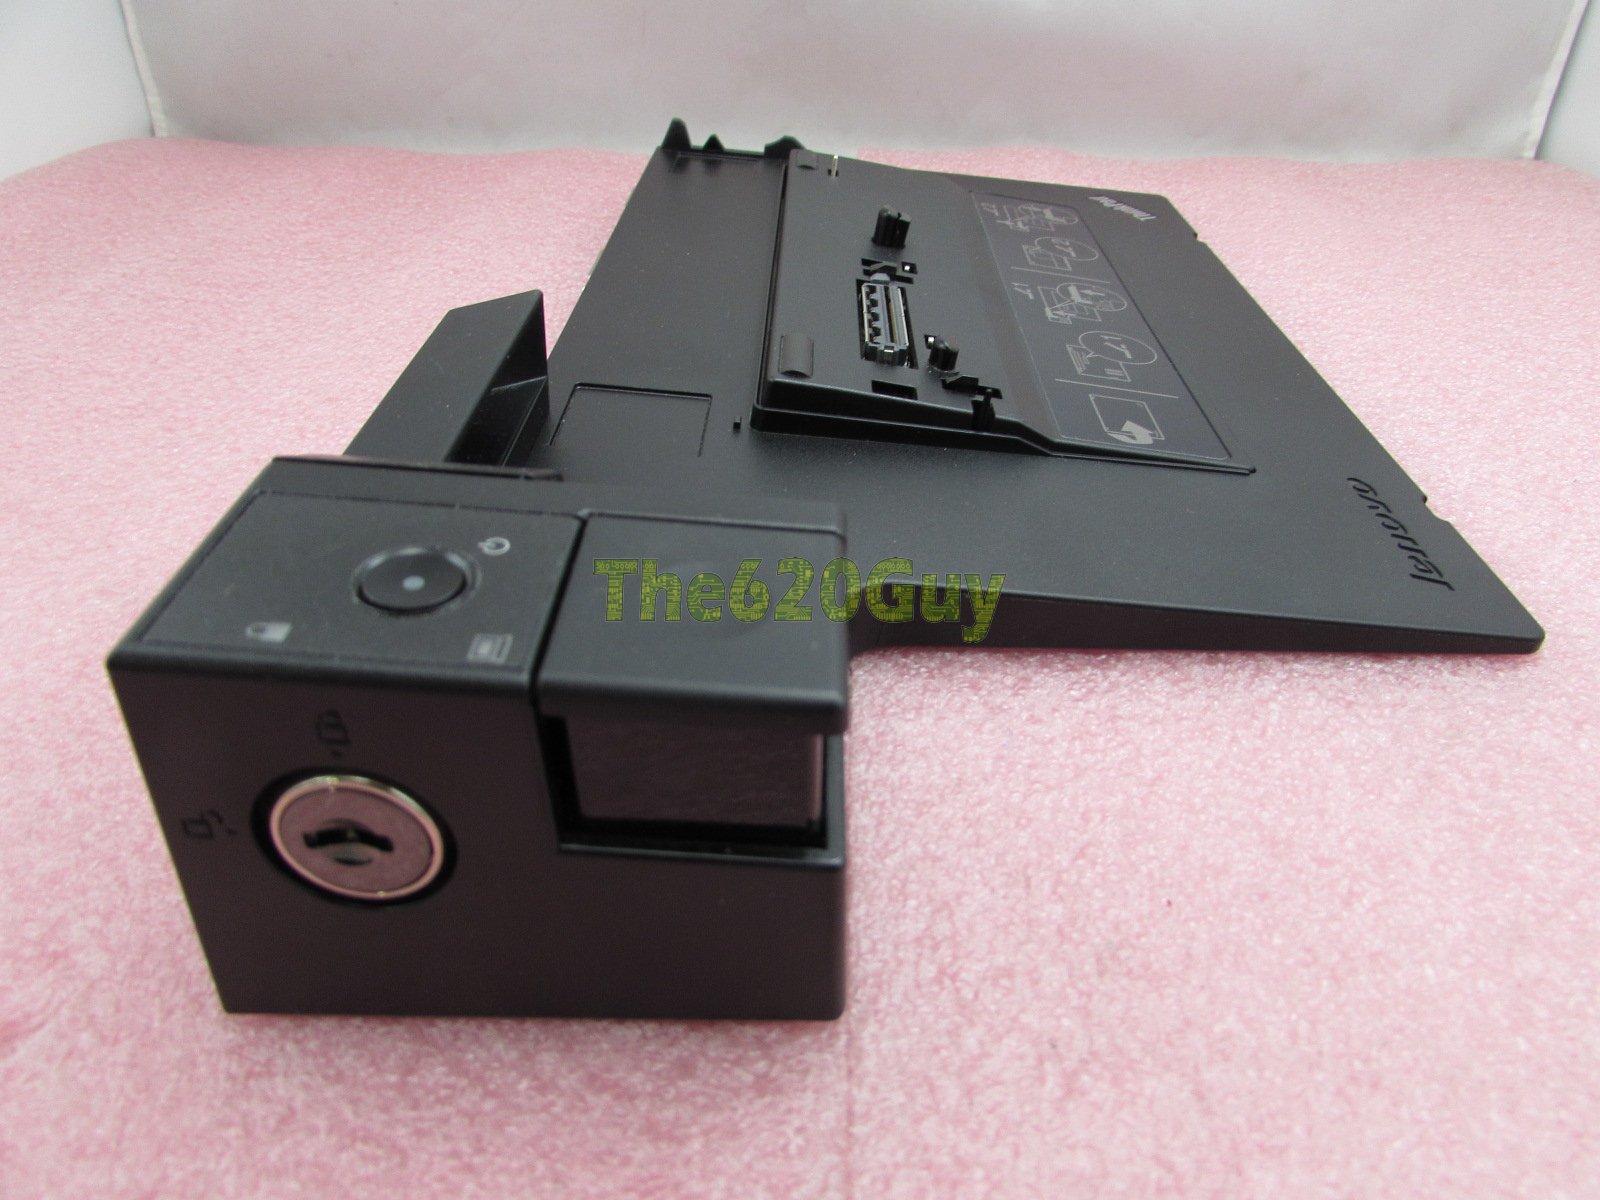 Lot of 2 Lenovo Thinkpad 4338 Mini Docking Station *NO KEYS* 75Y5730 75Y5731